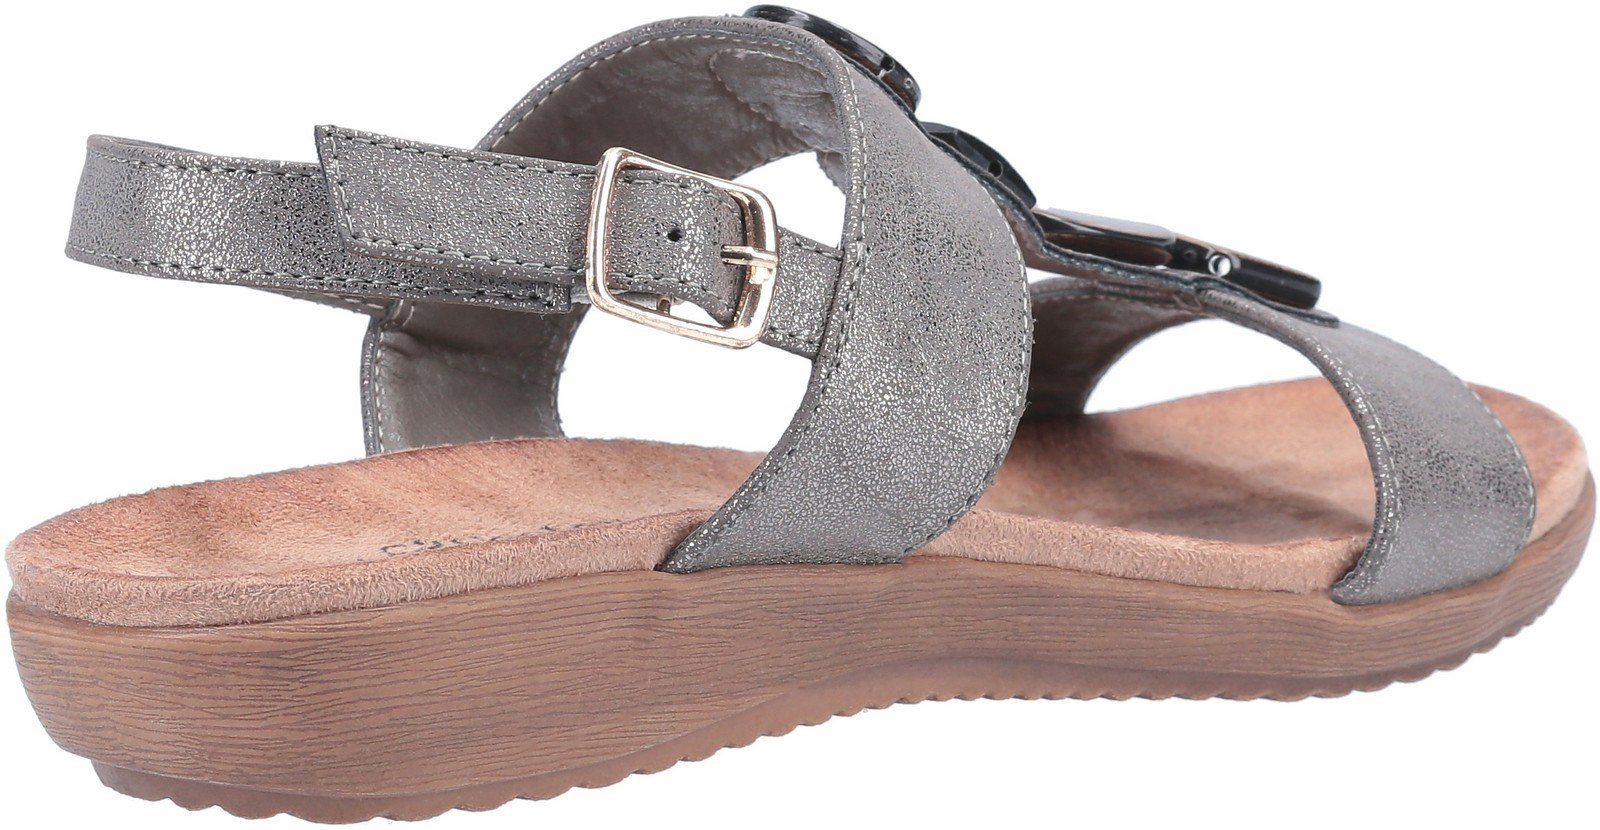 Fleet & Foster Women's Rosa Buckle Sandal Various Colours 30101 - Grey 4